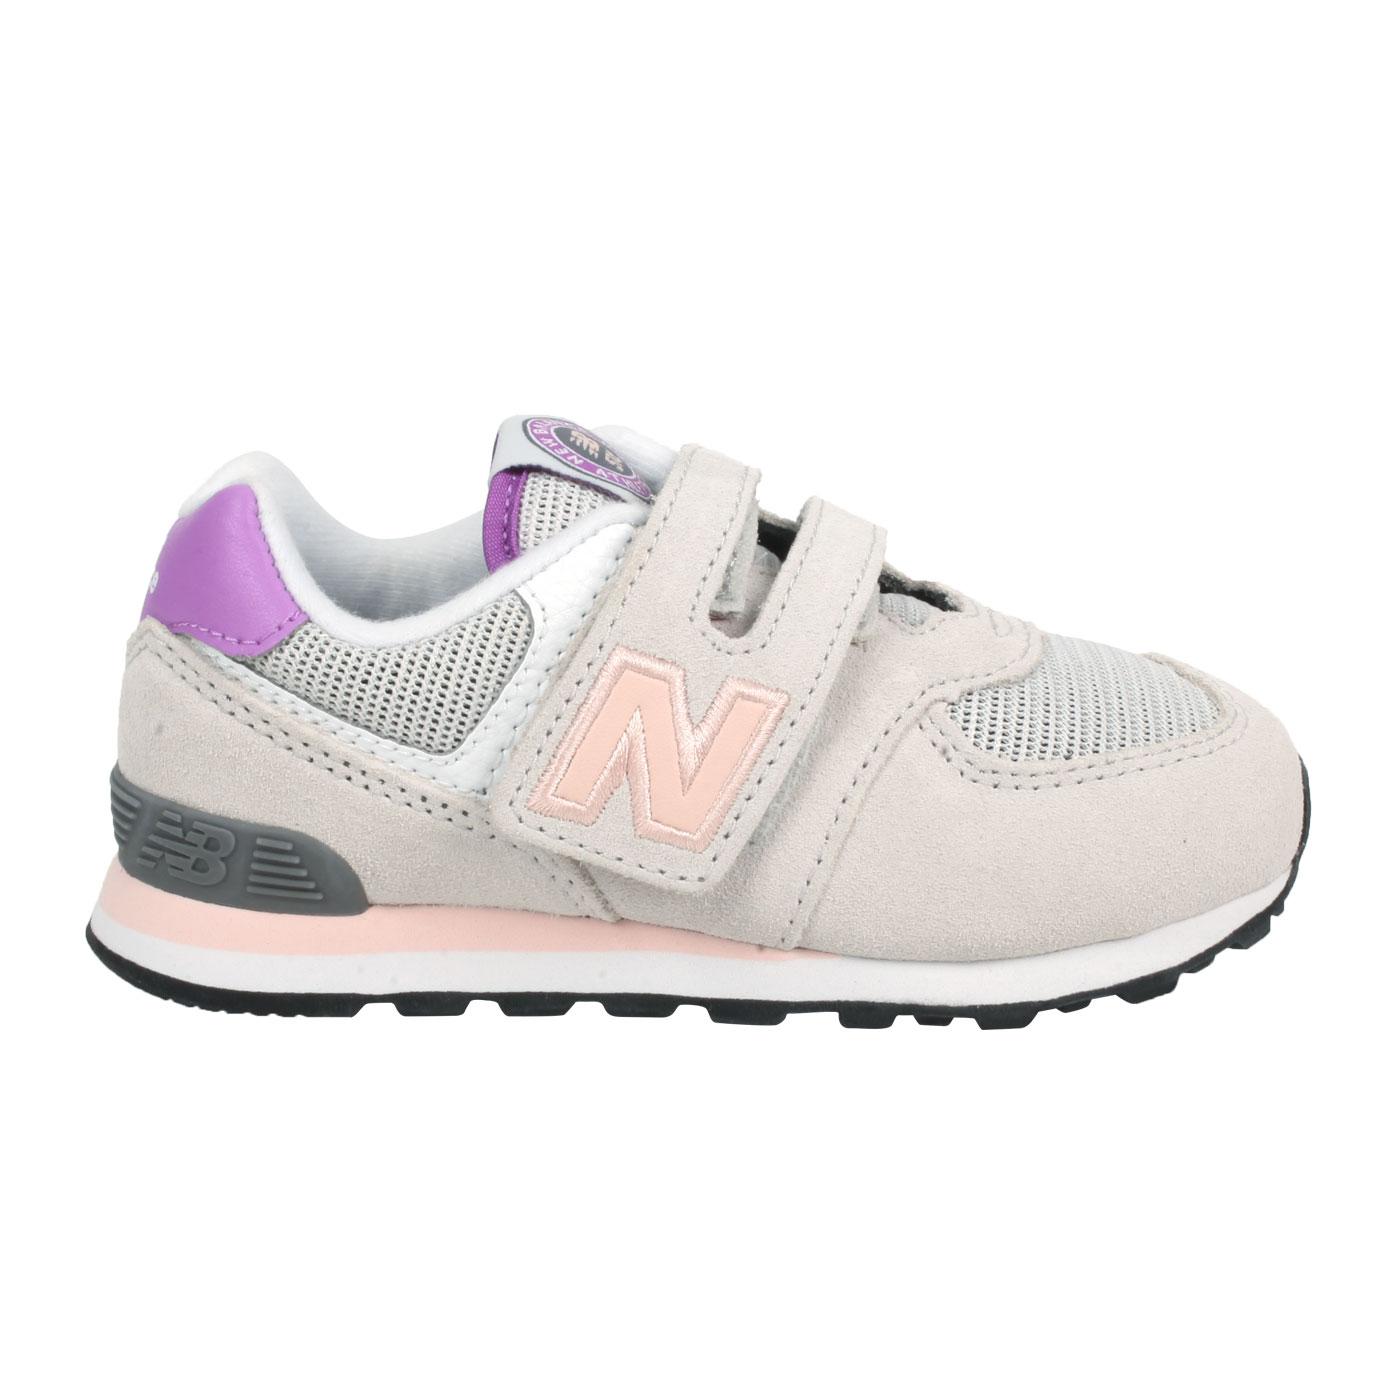 NEW BALANCE 小童休閒運動鞋-WIDE IV574HZ1 - 淺灰粉橘